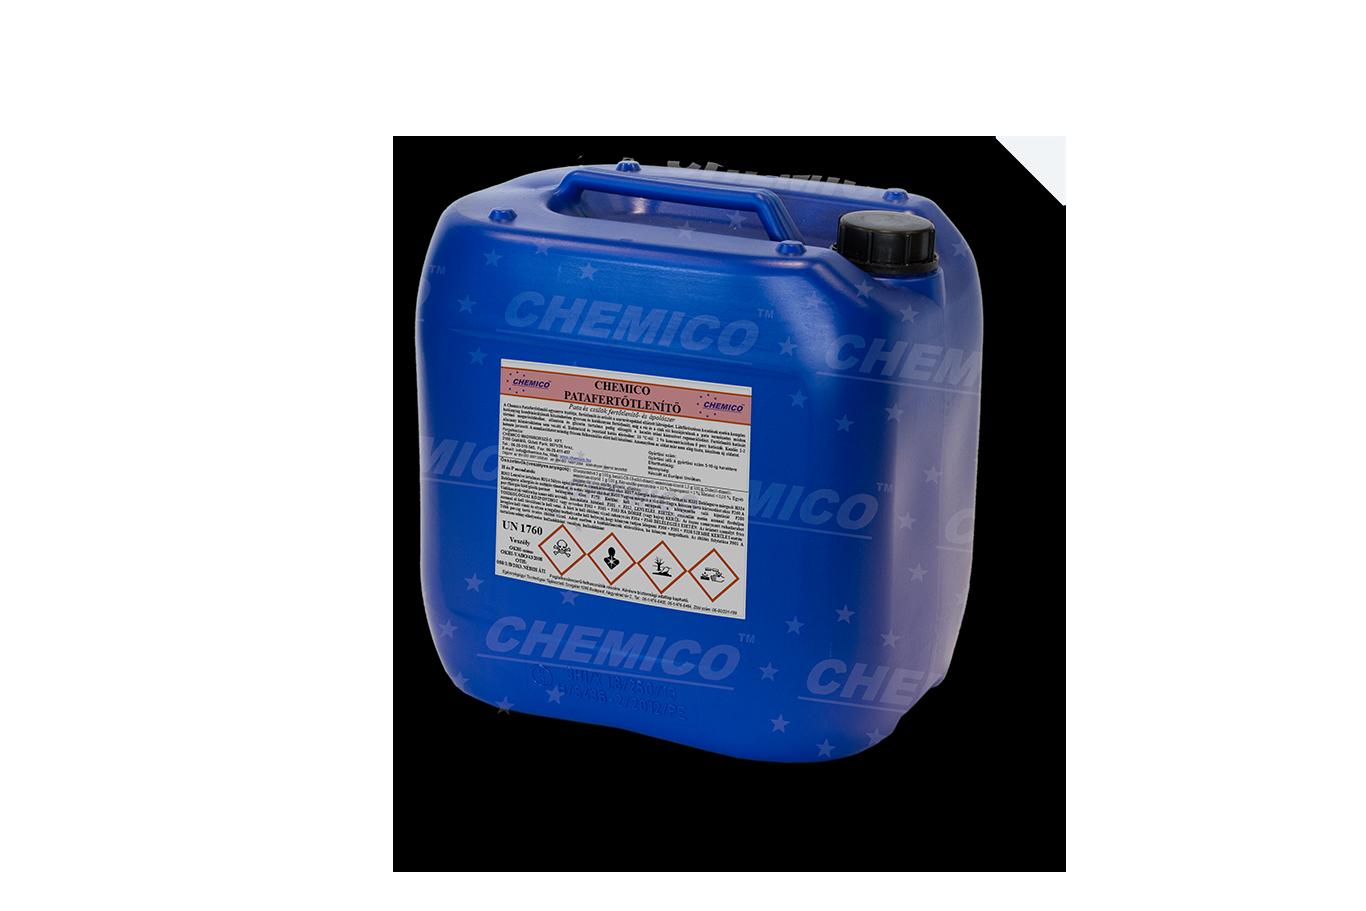 chemico-patafertotlenito-szer-ipari-csulok-fertotlenito-apolo-allattenyesztes-baktericid-30l